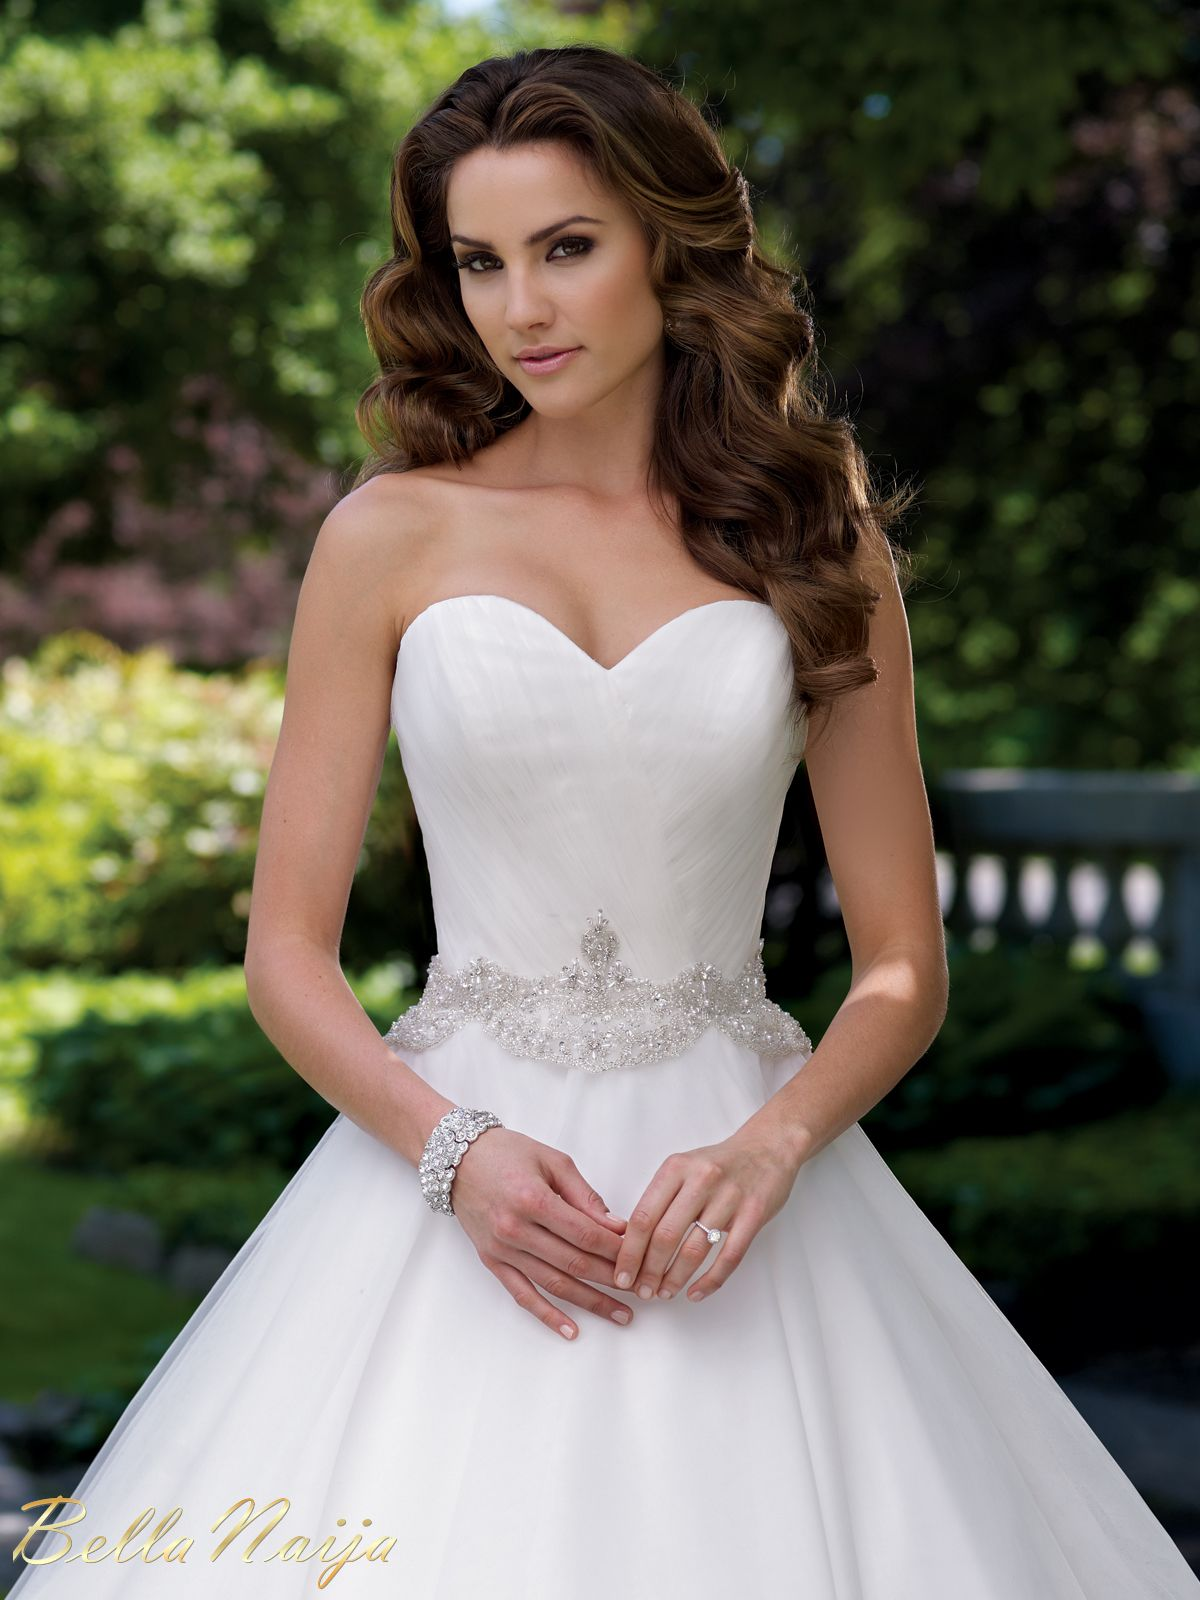 Bn bridal david tutera for mon cheri spring 2013 collection for David tutera wedding dresses